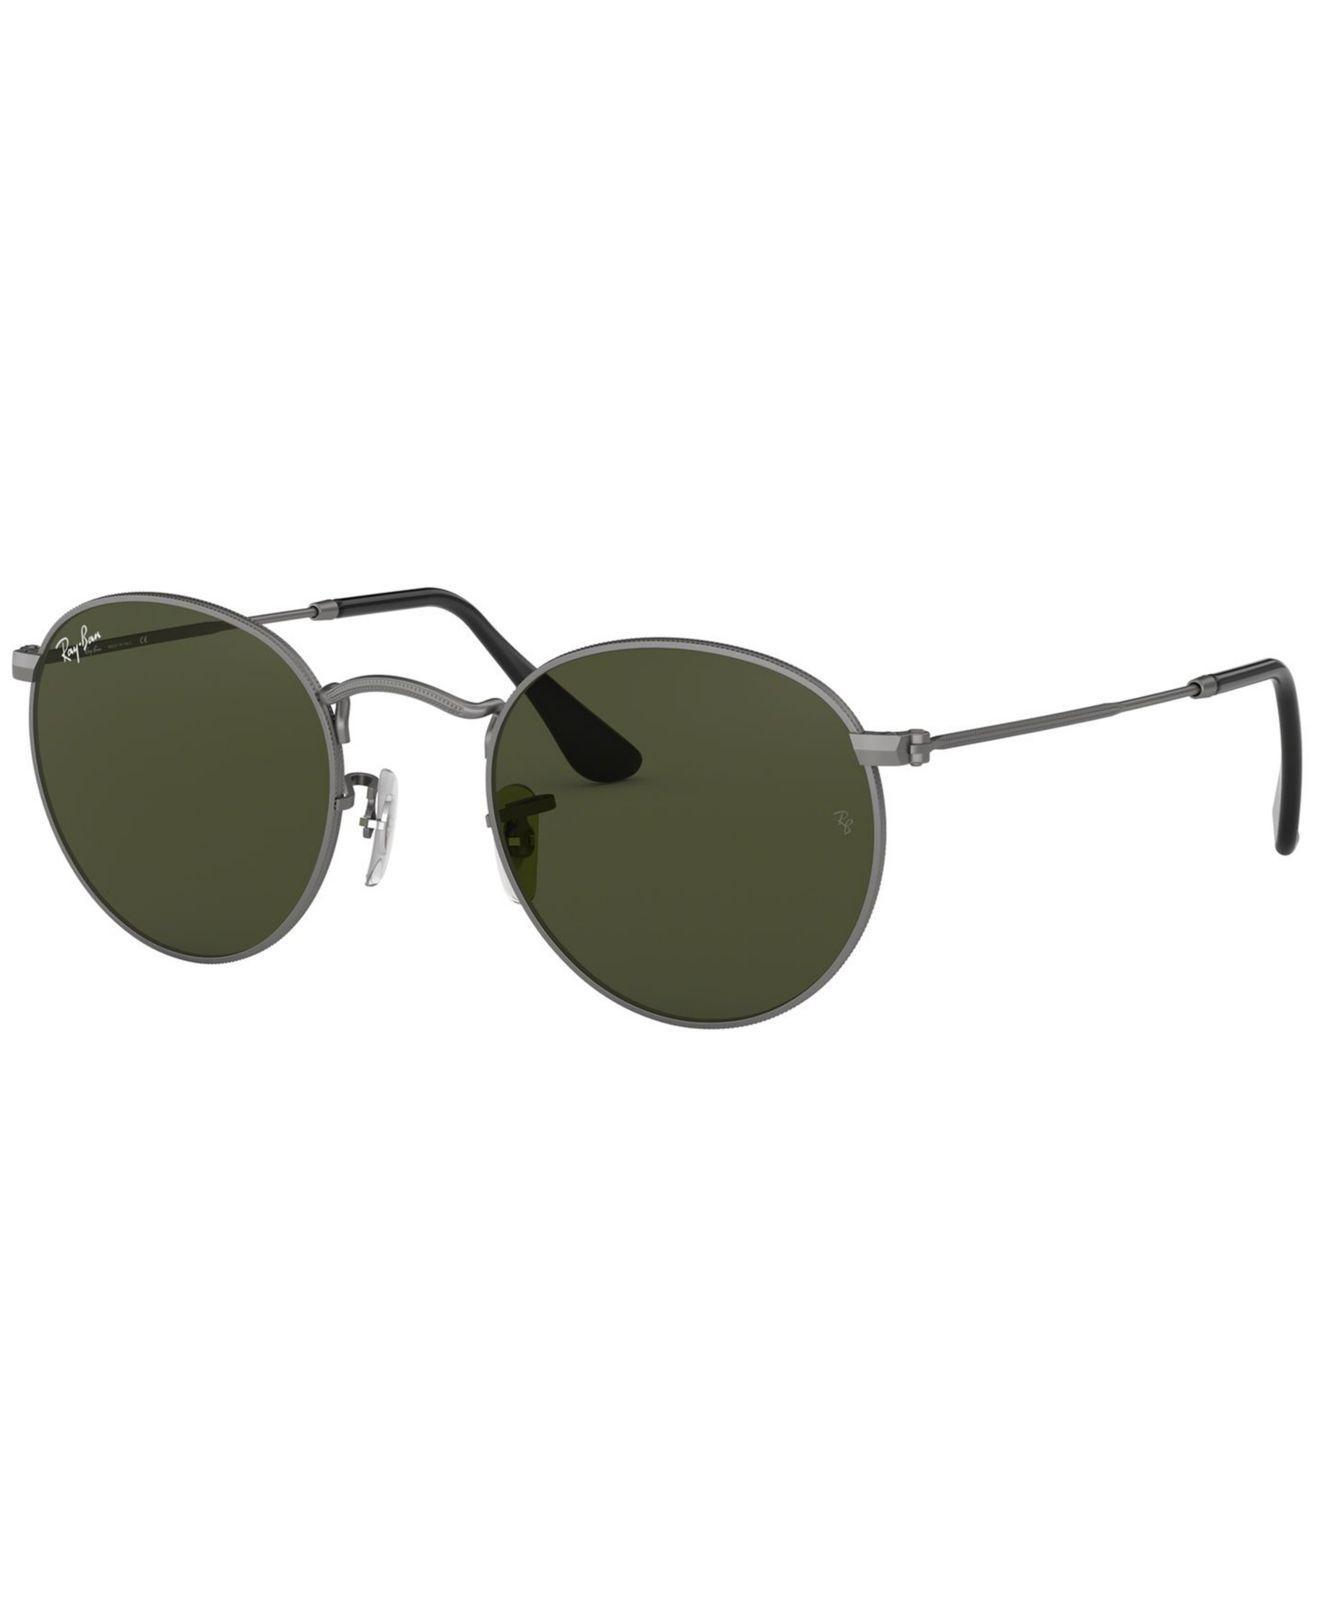 48ce08aa46 Ray-Ban. Women s Green Sunglasses